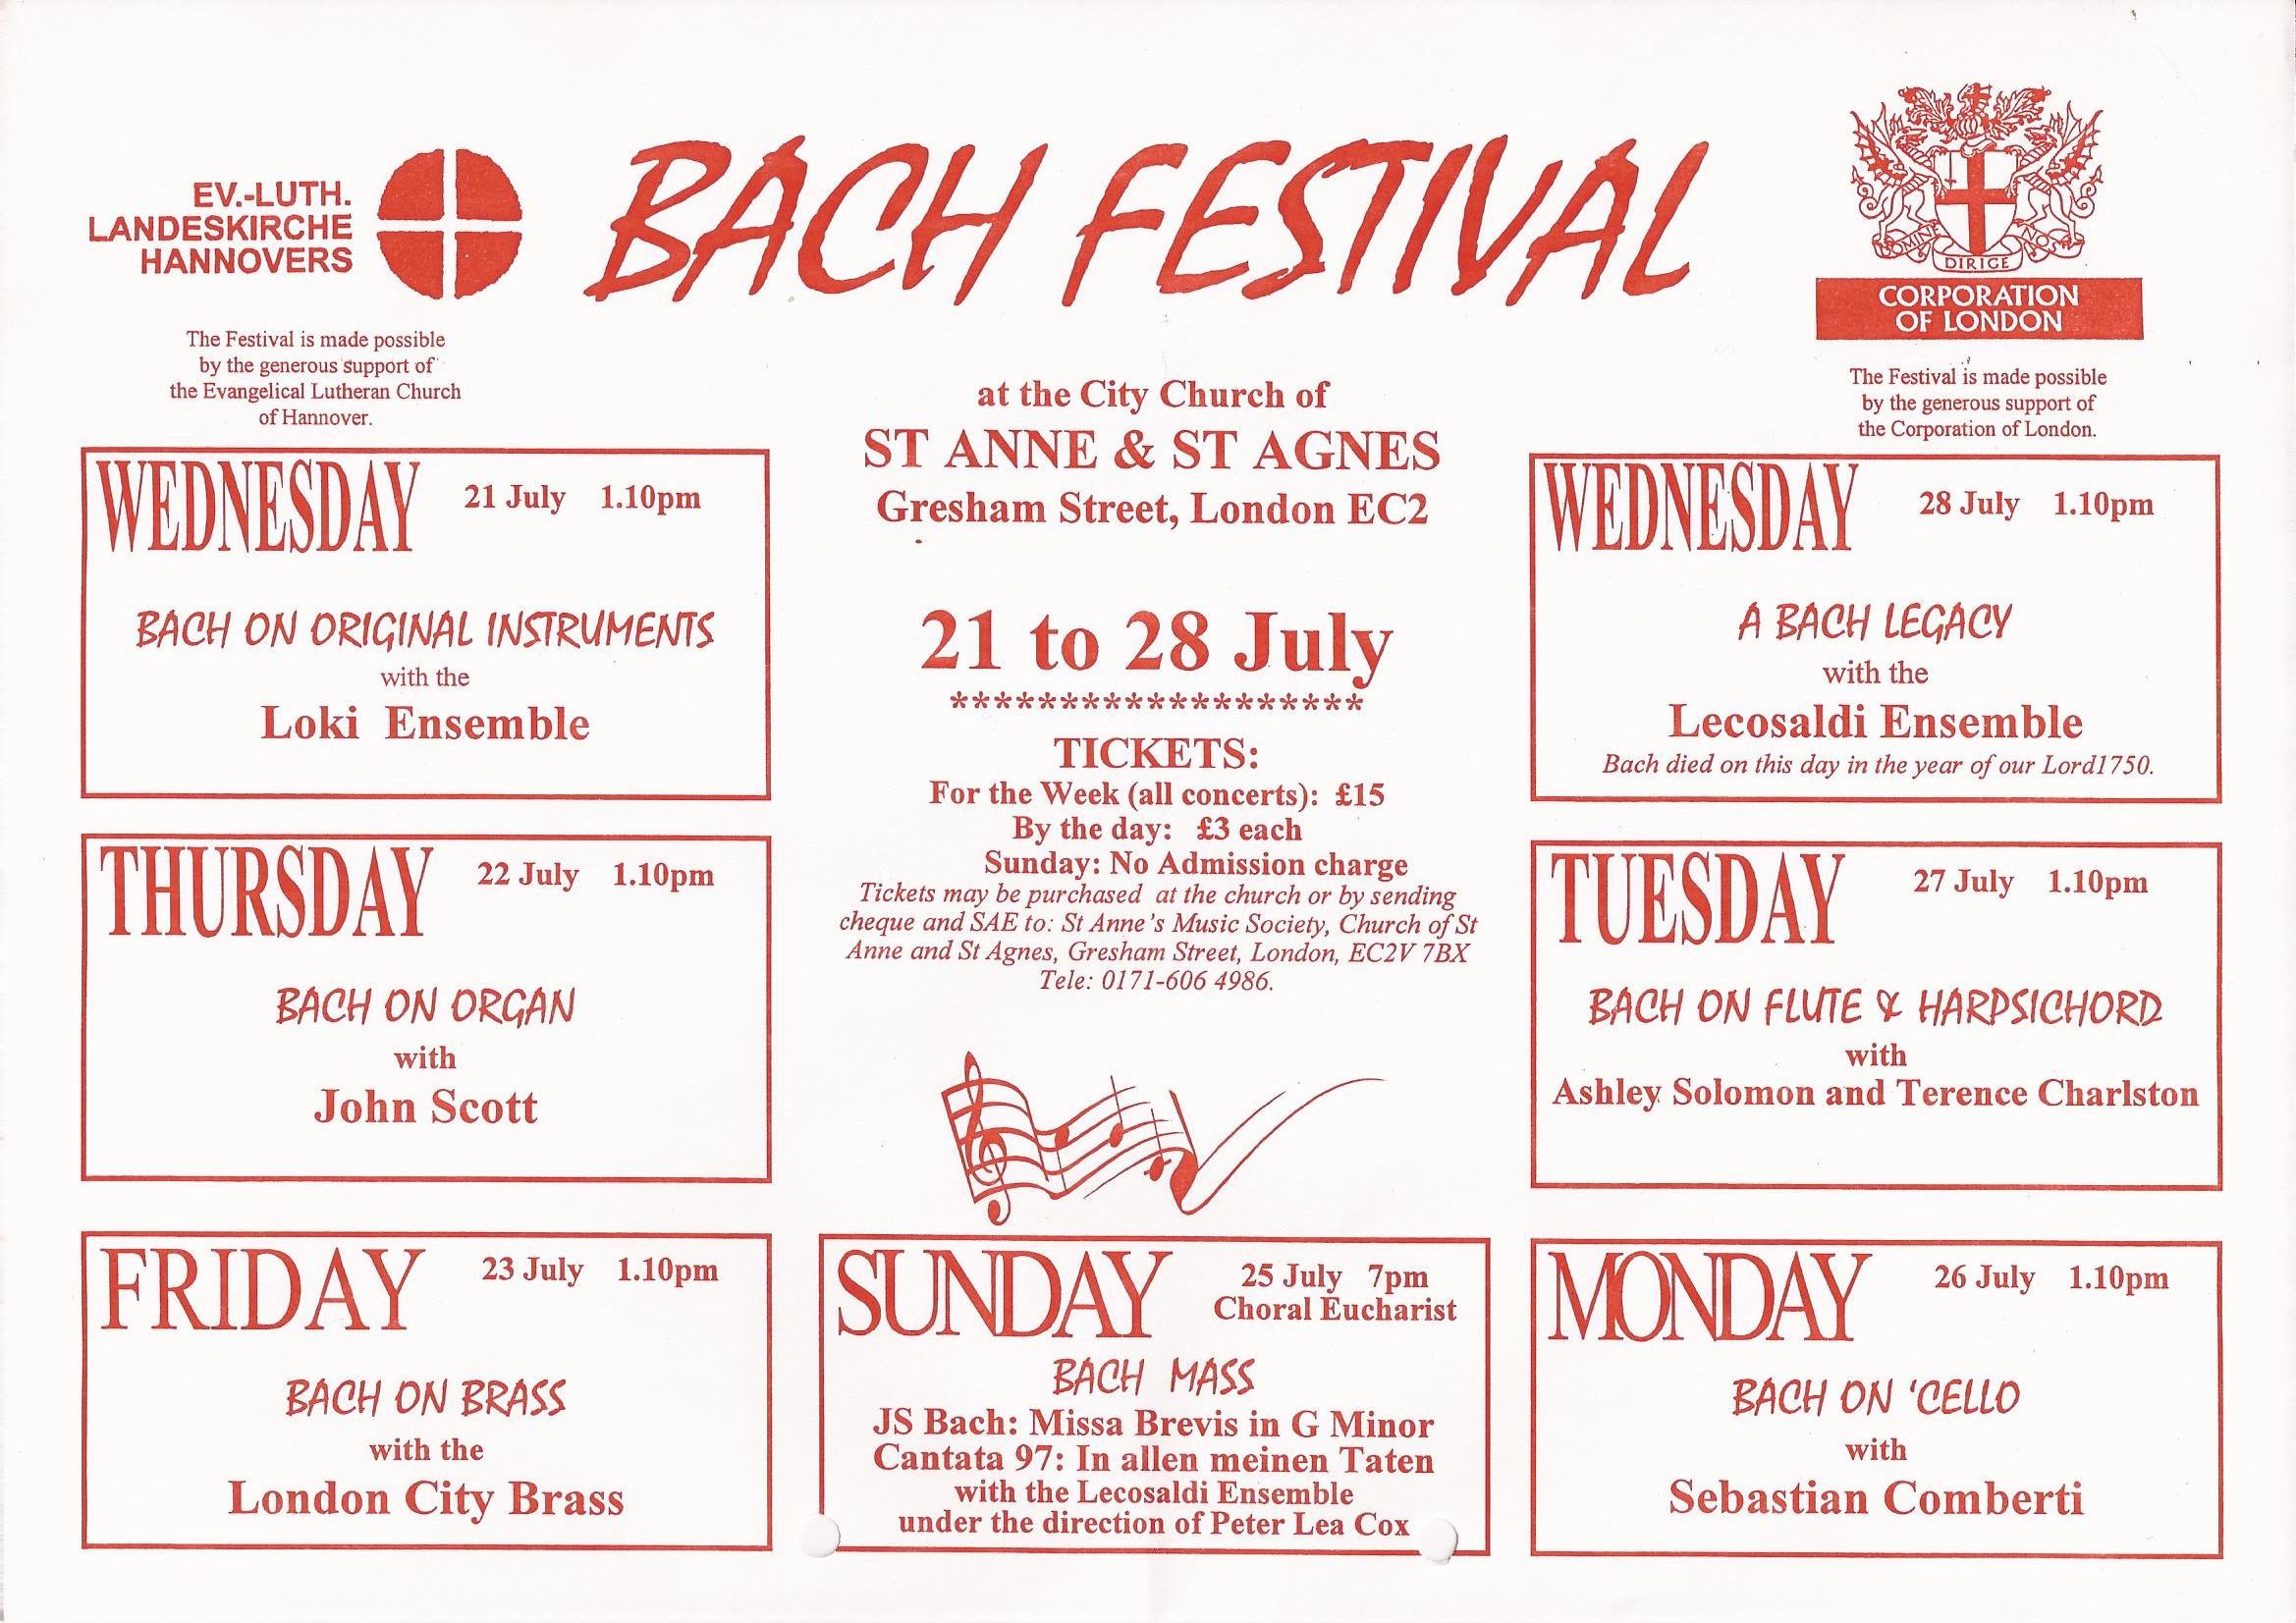 bach-festival-1999